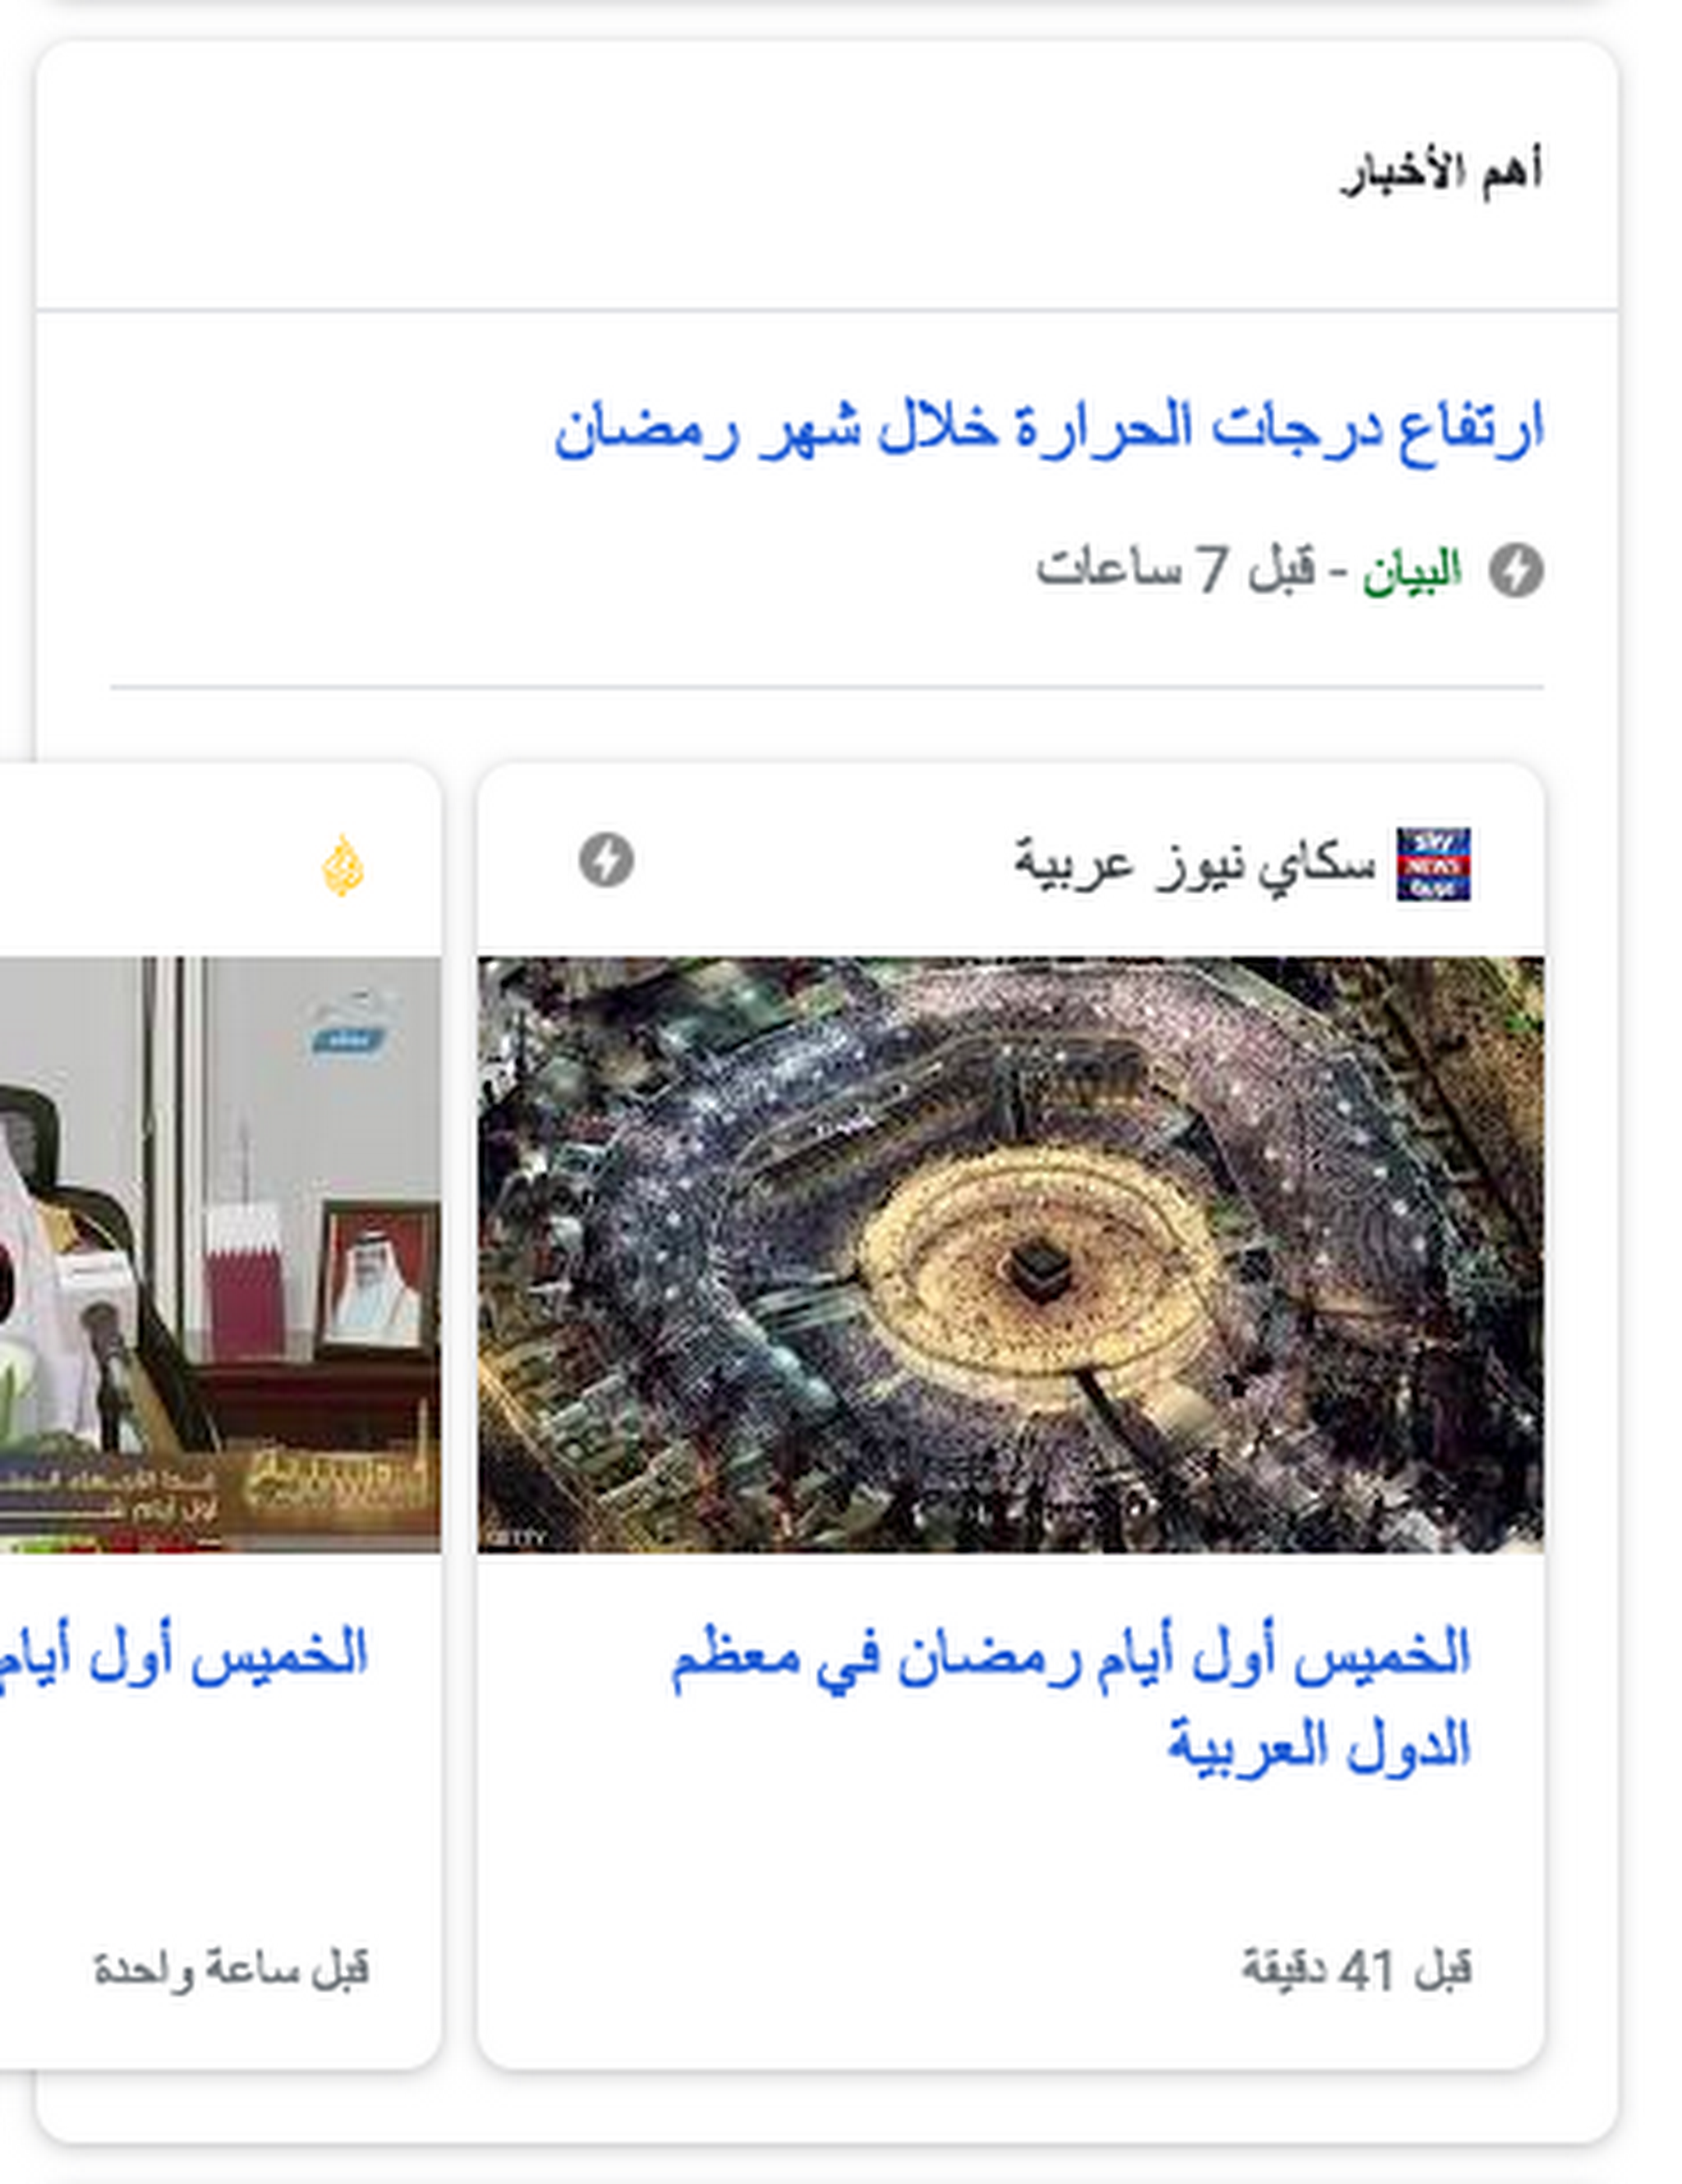 Ramadan Kareem! Get in the Ramadan spirit with Google